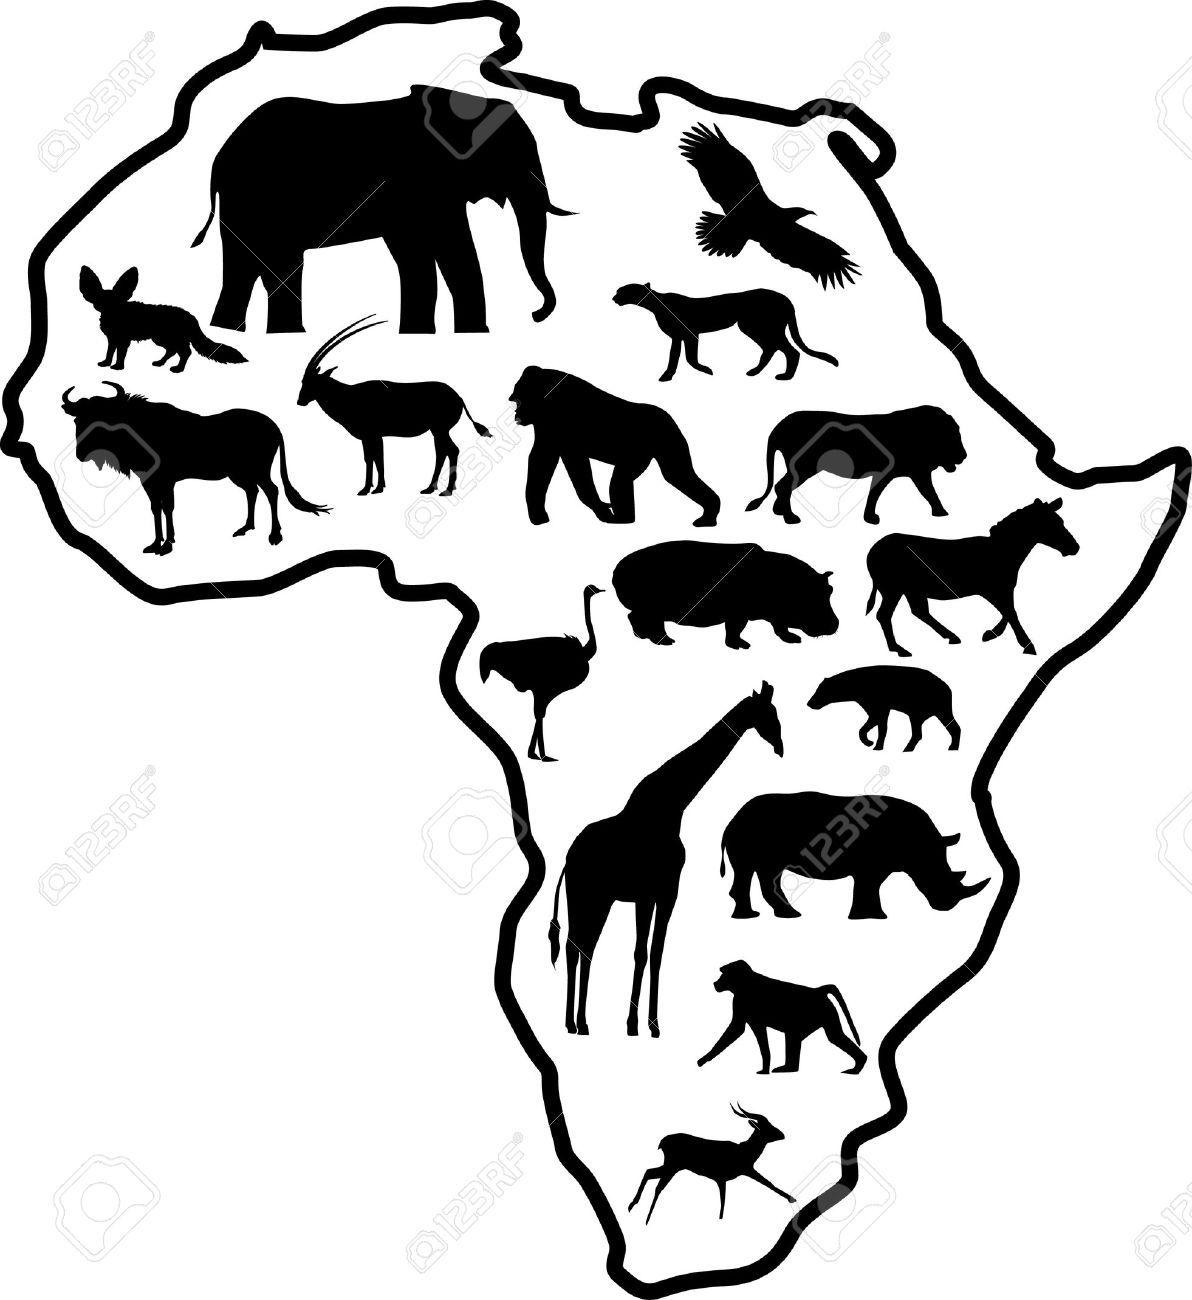 safari animal silhouette clip art at getdrawings com free for rh getdrawings com free baby shower safari clipart free safari clipart borders